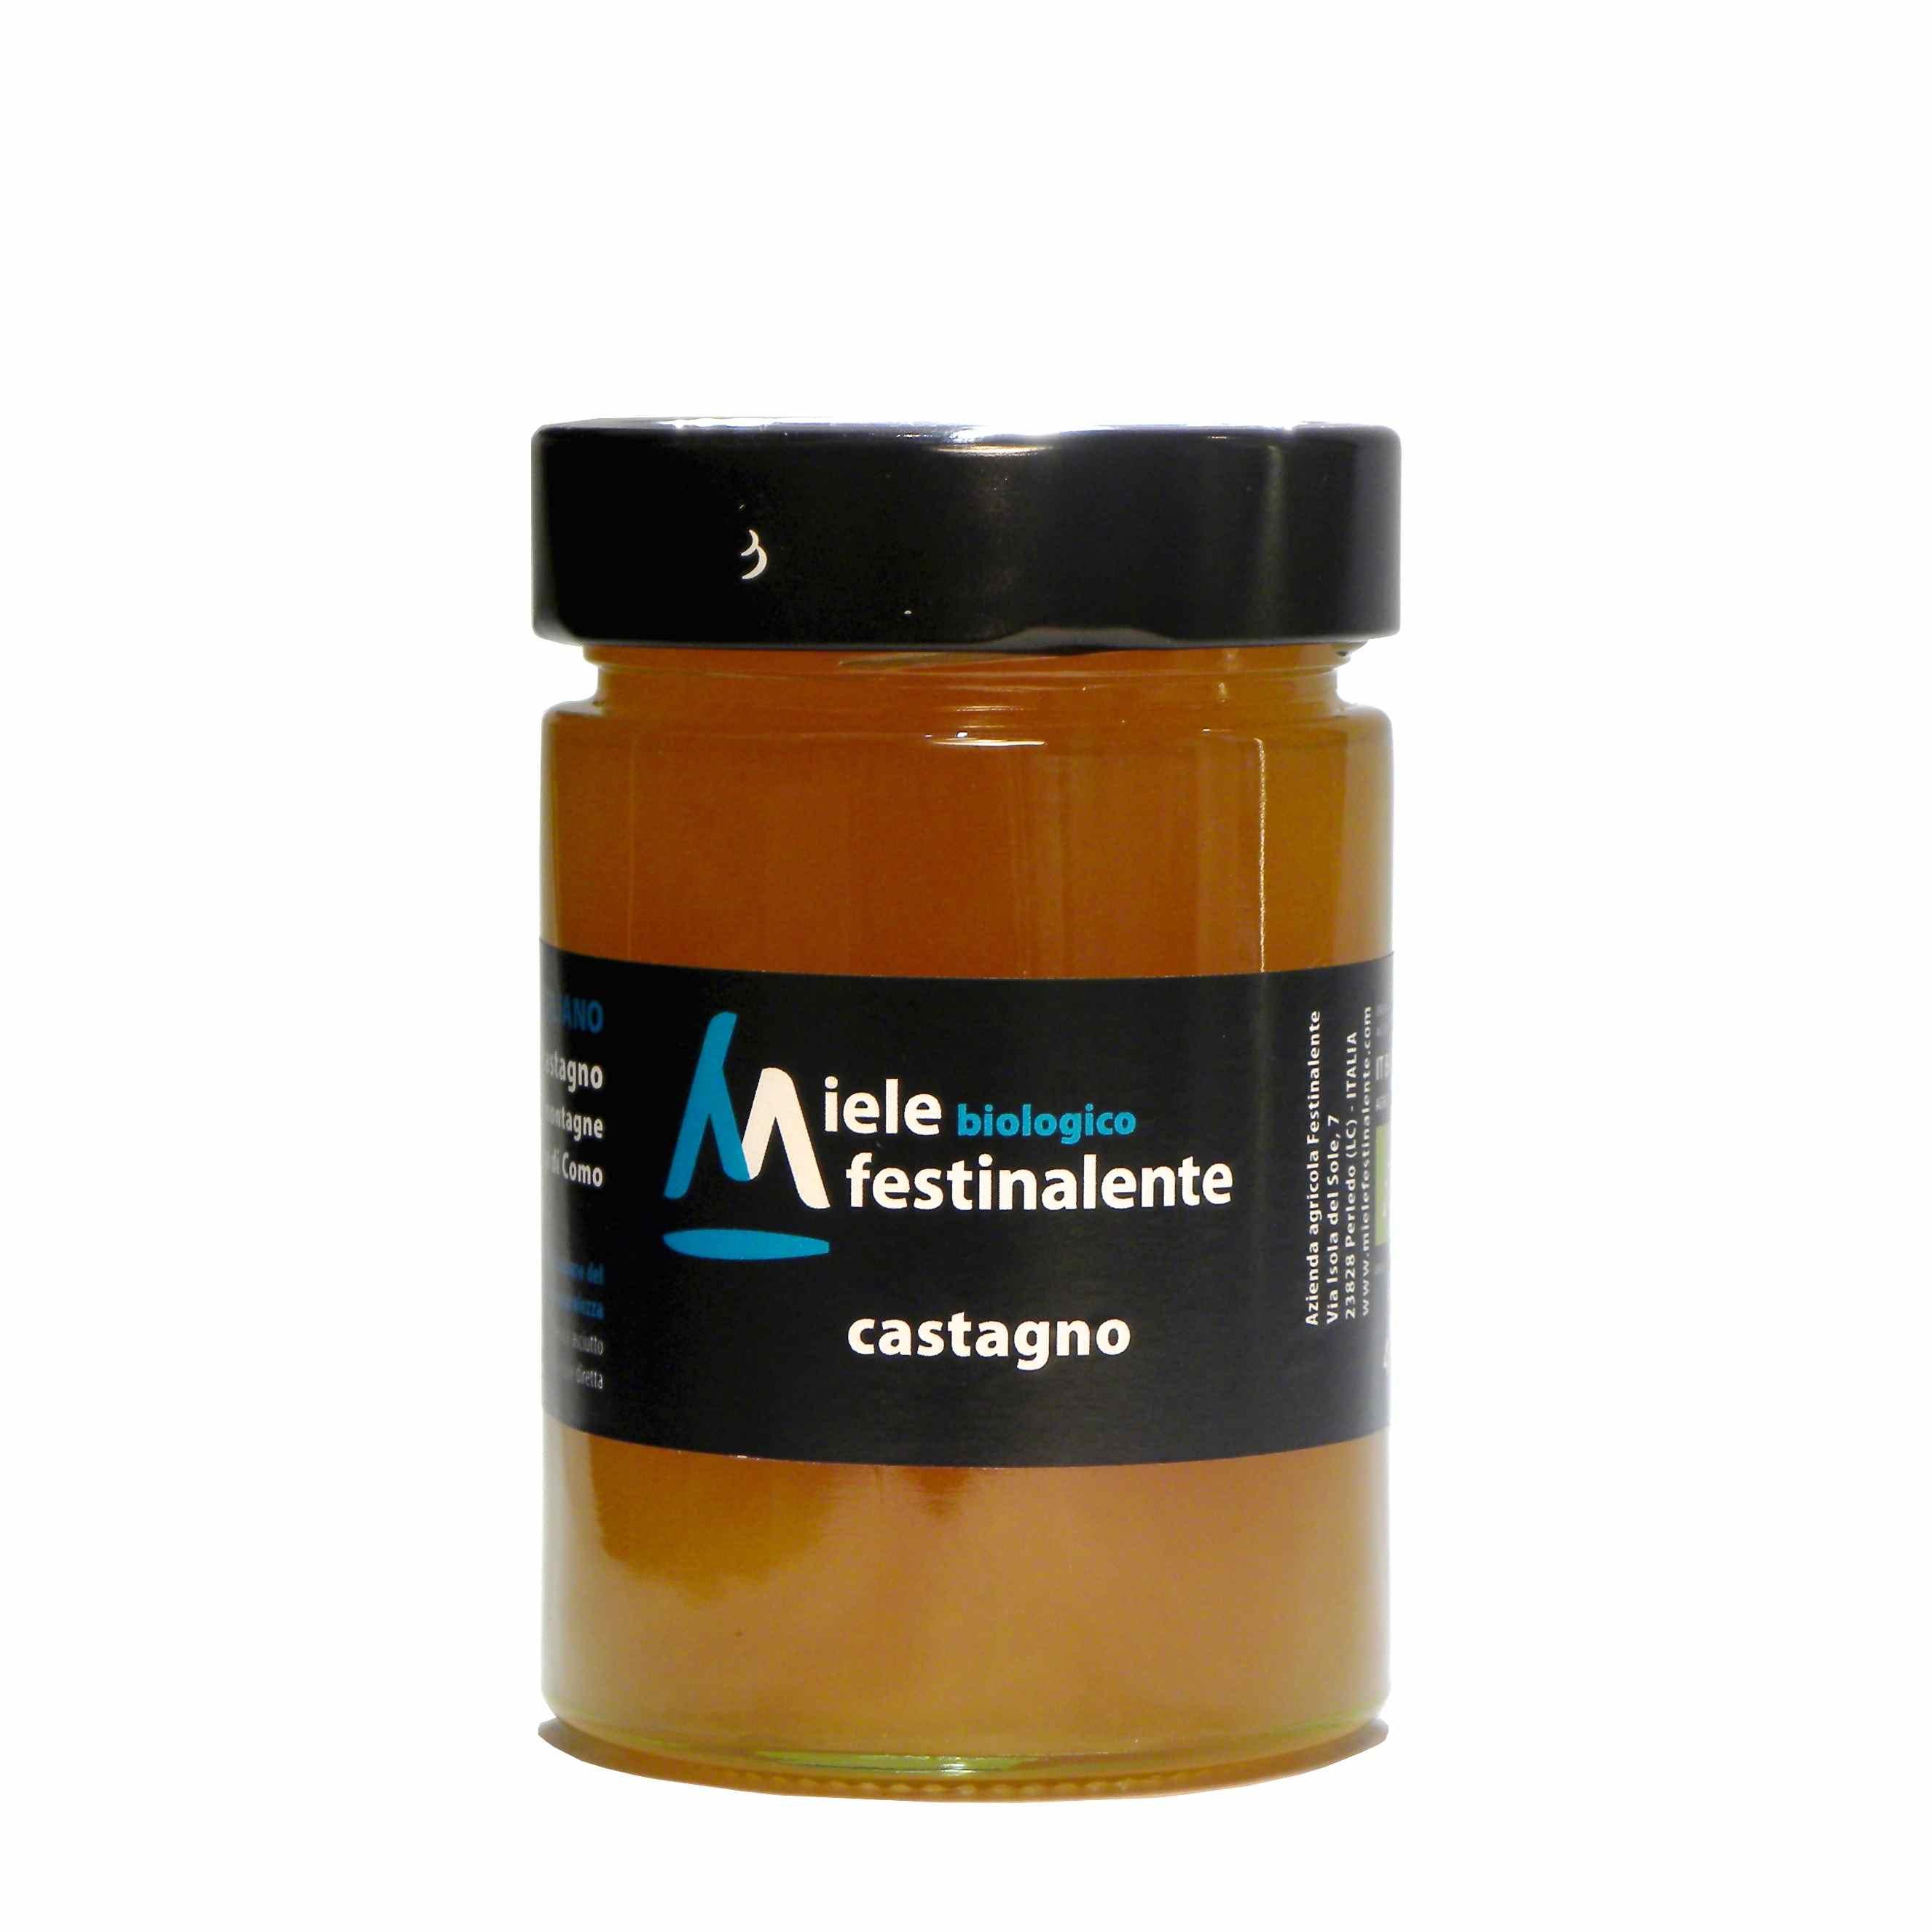 Festinalente miele bio castagno – Festinalente organic raw chestnut honey – Gustorotondo – Italian food boutique